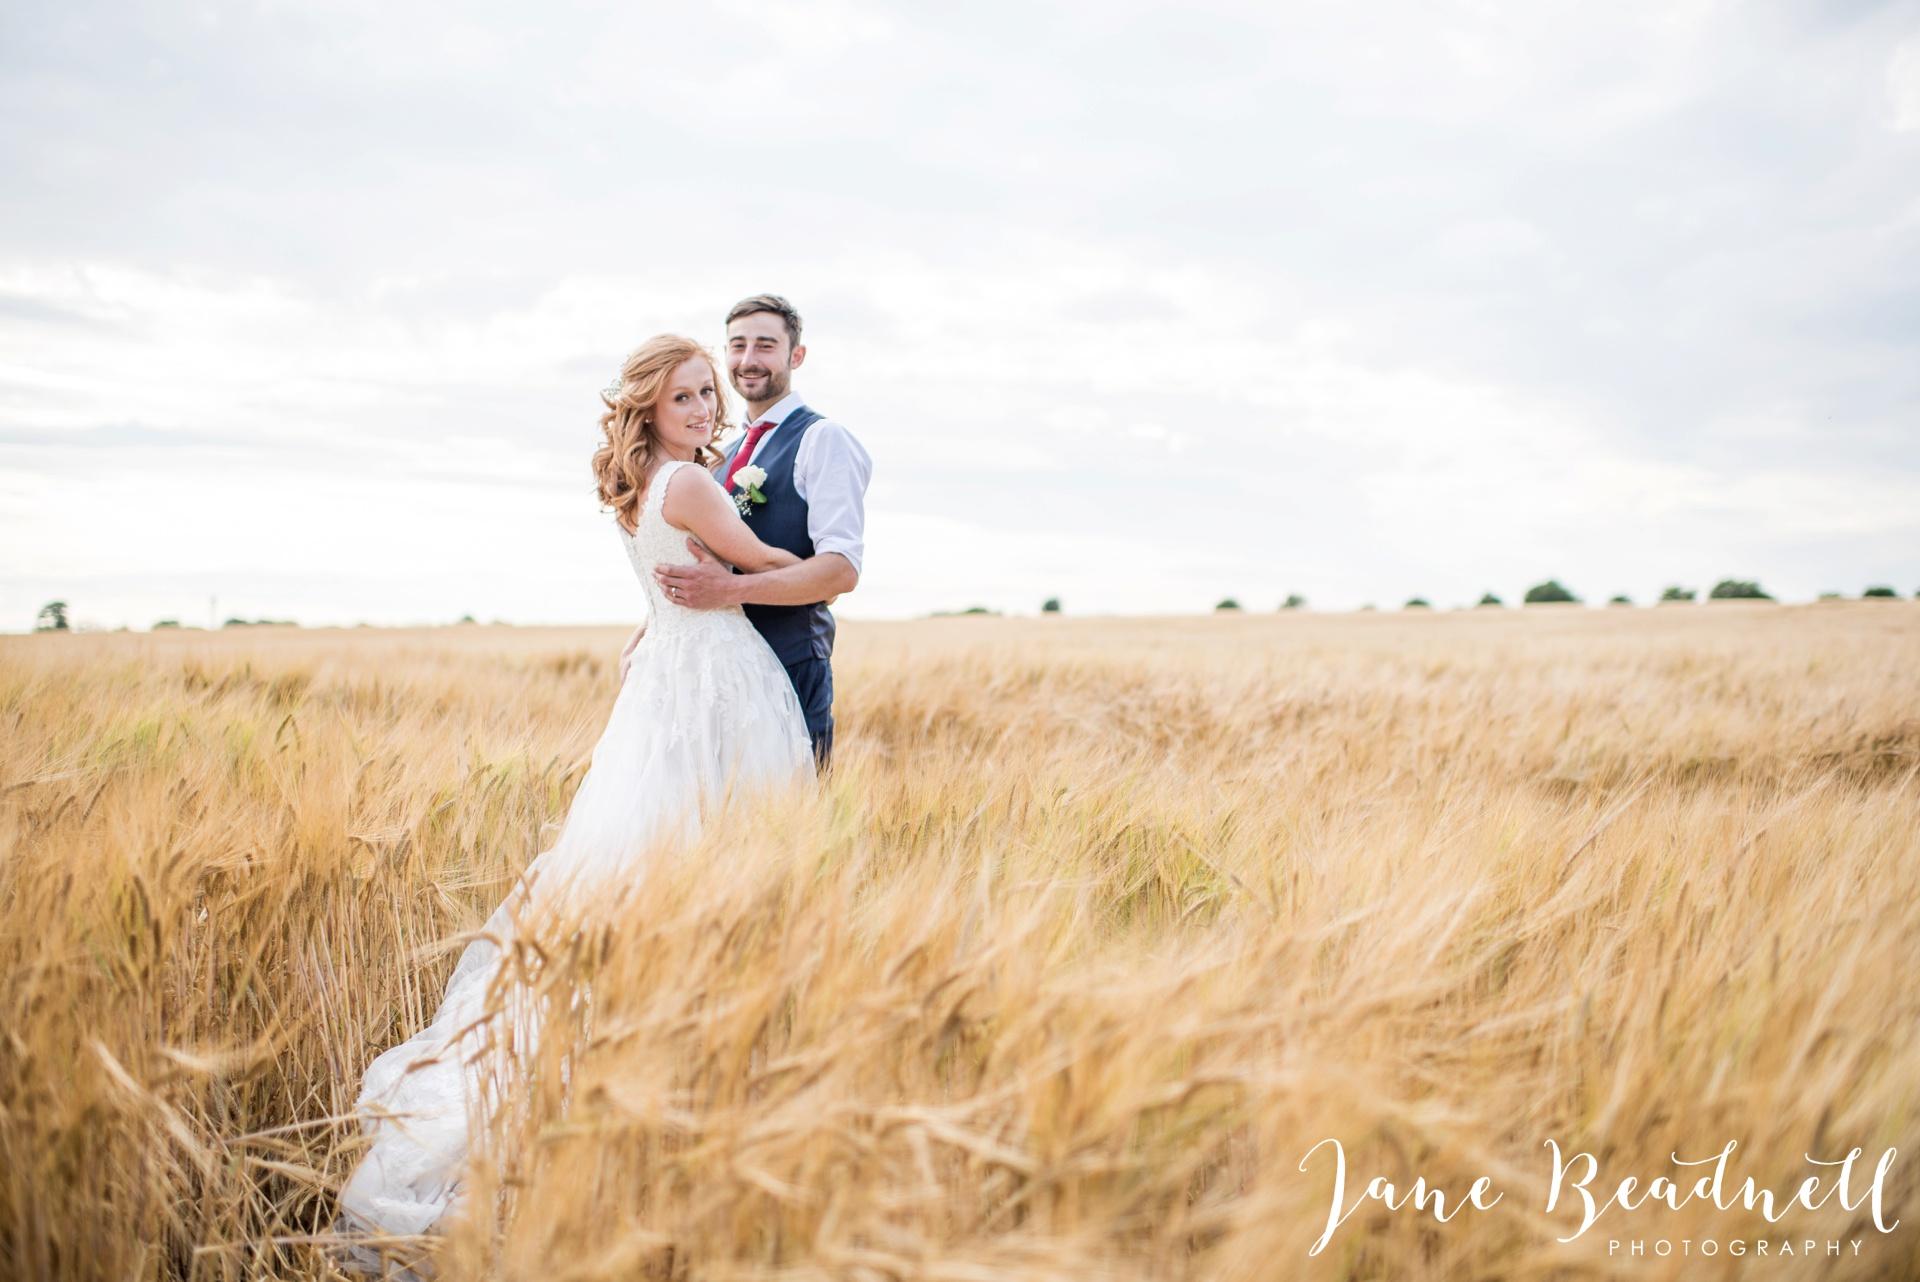 yorkshire-fine-art-wedding-photographer-jane-beadnell-photography-poppleton-york_0124